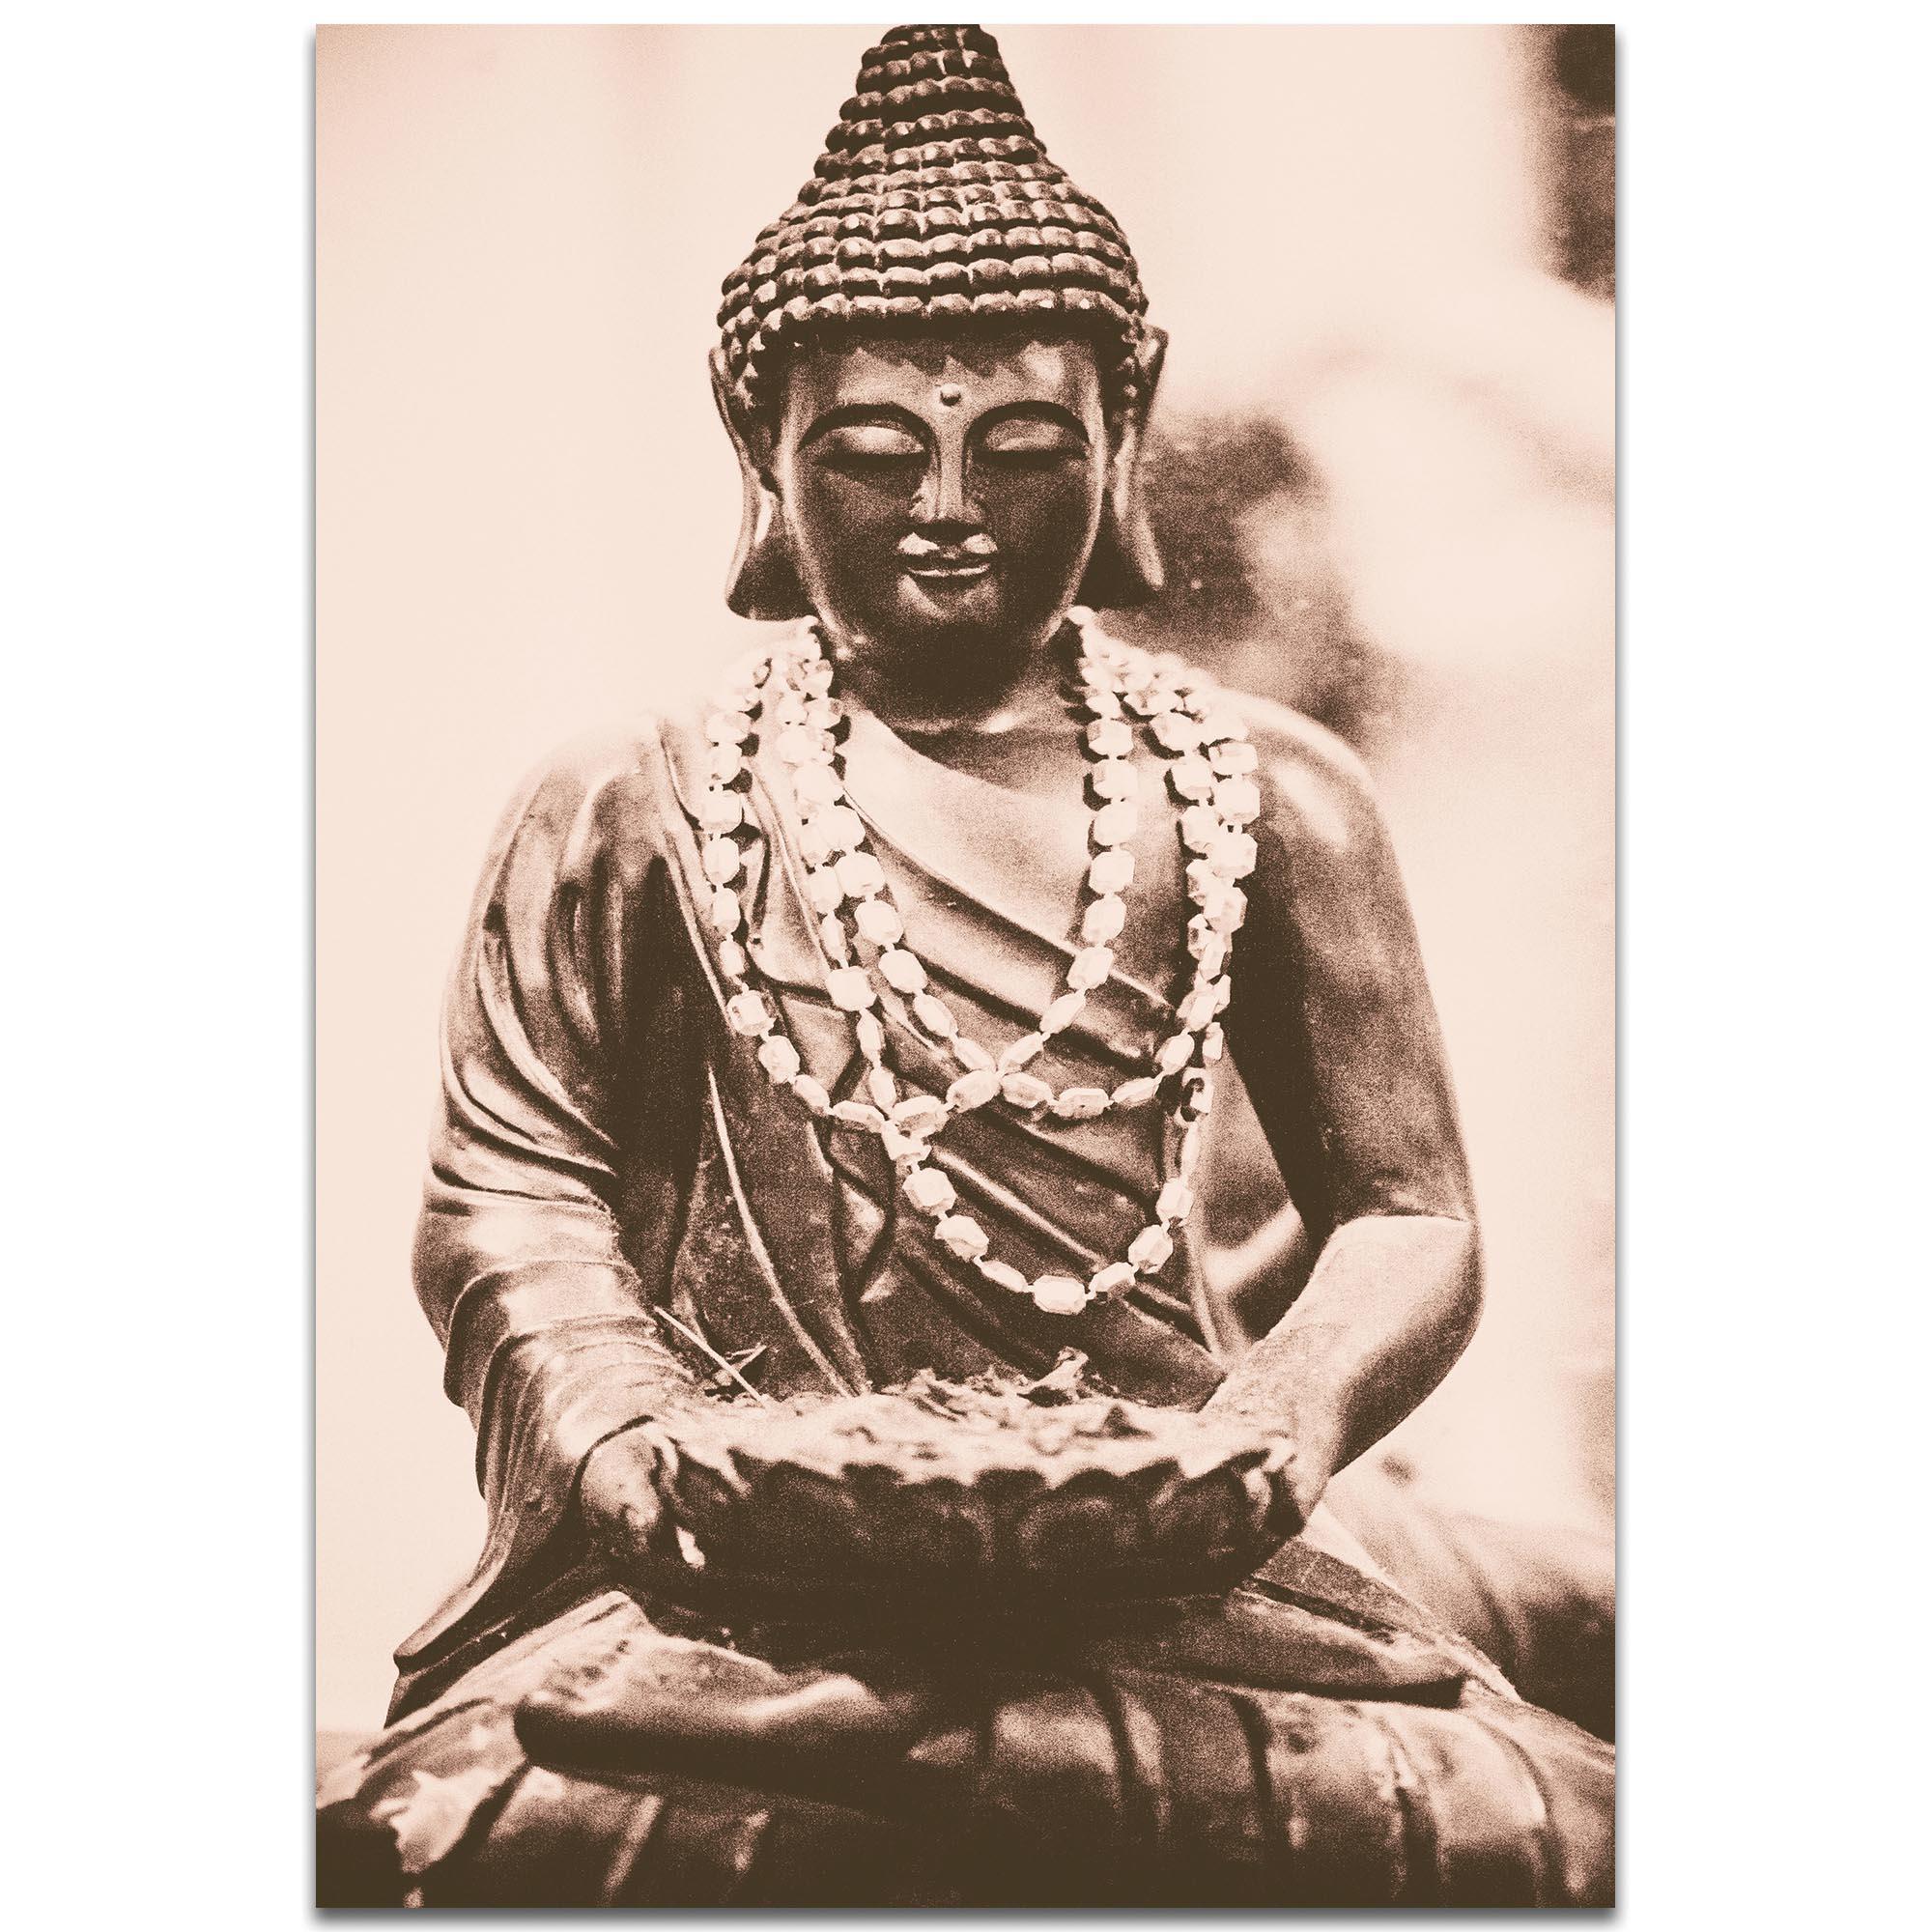 Eclectic Wall Art 'Buddha Statue' - Religion Decor on Metal or Plexiglass